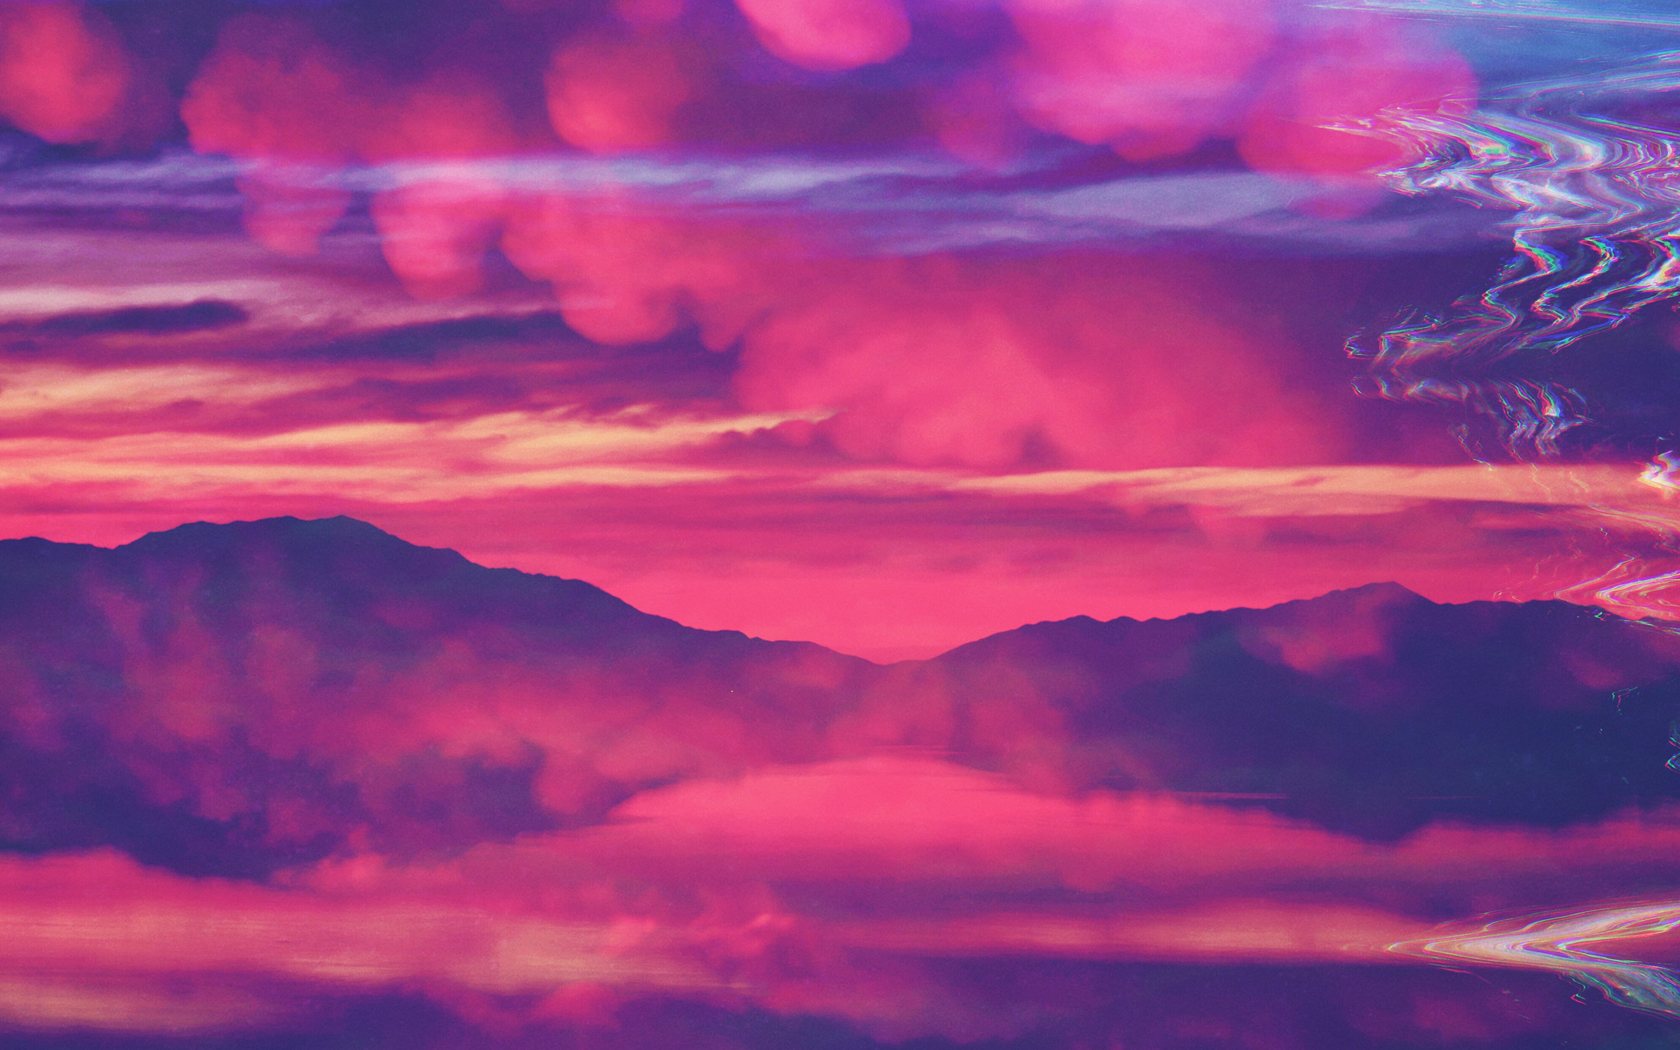 Espejo Lake_Wallpaper by Shorsh.jpg